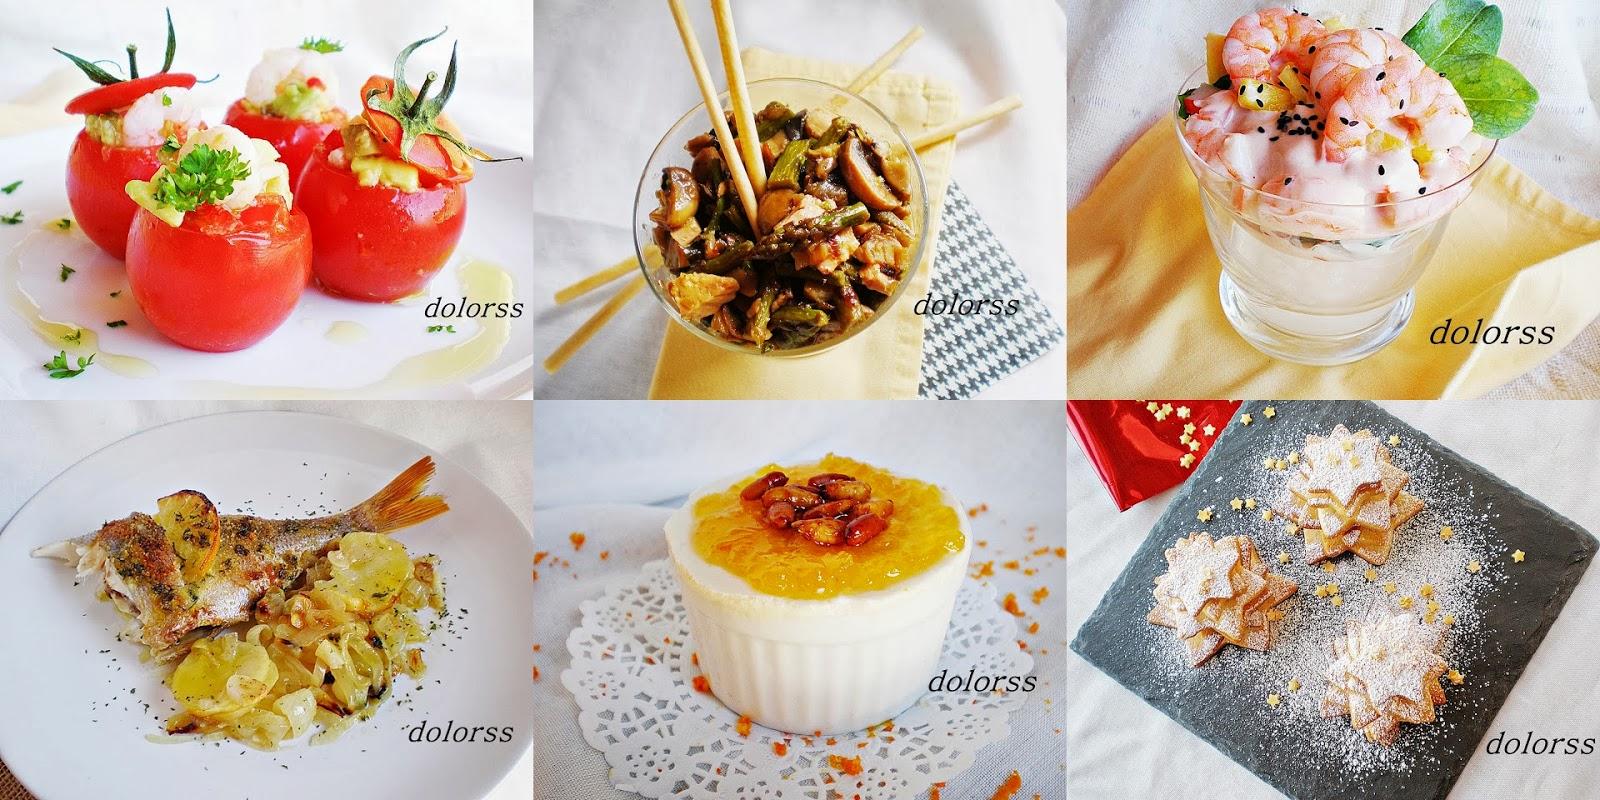 Blog de cuina de la dolorss men fin de a o a o nuevo - Menus para fin de ano ...